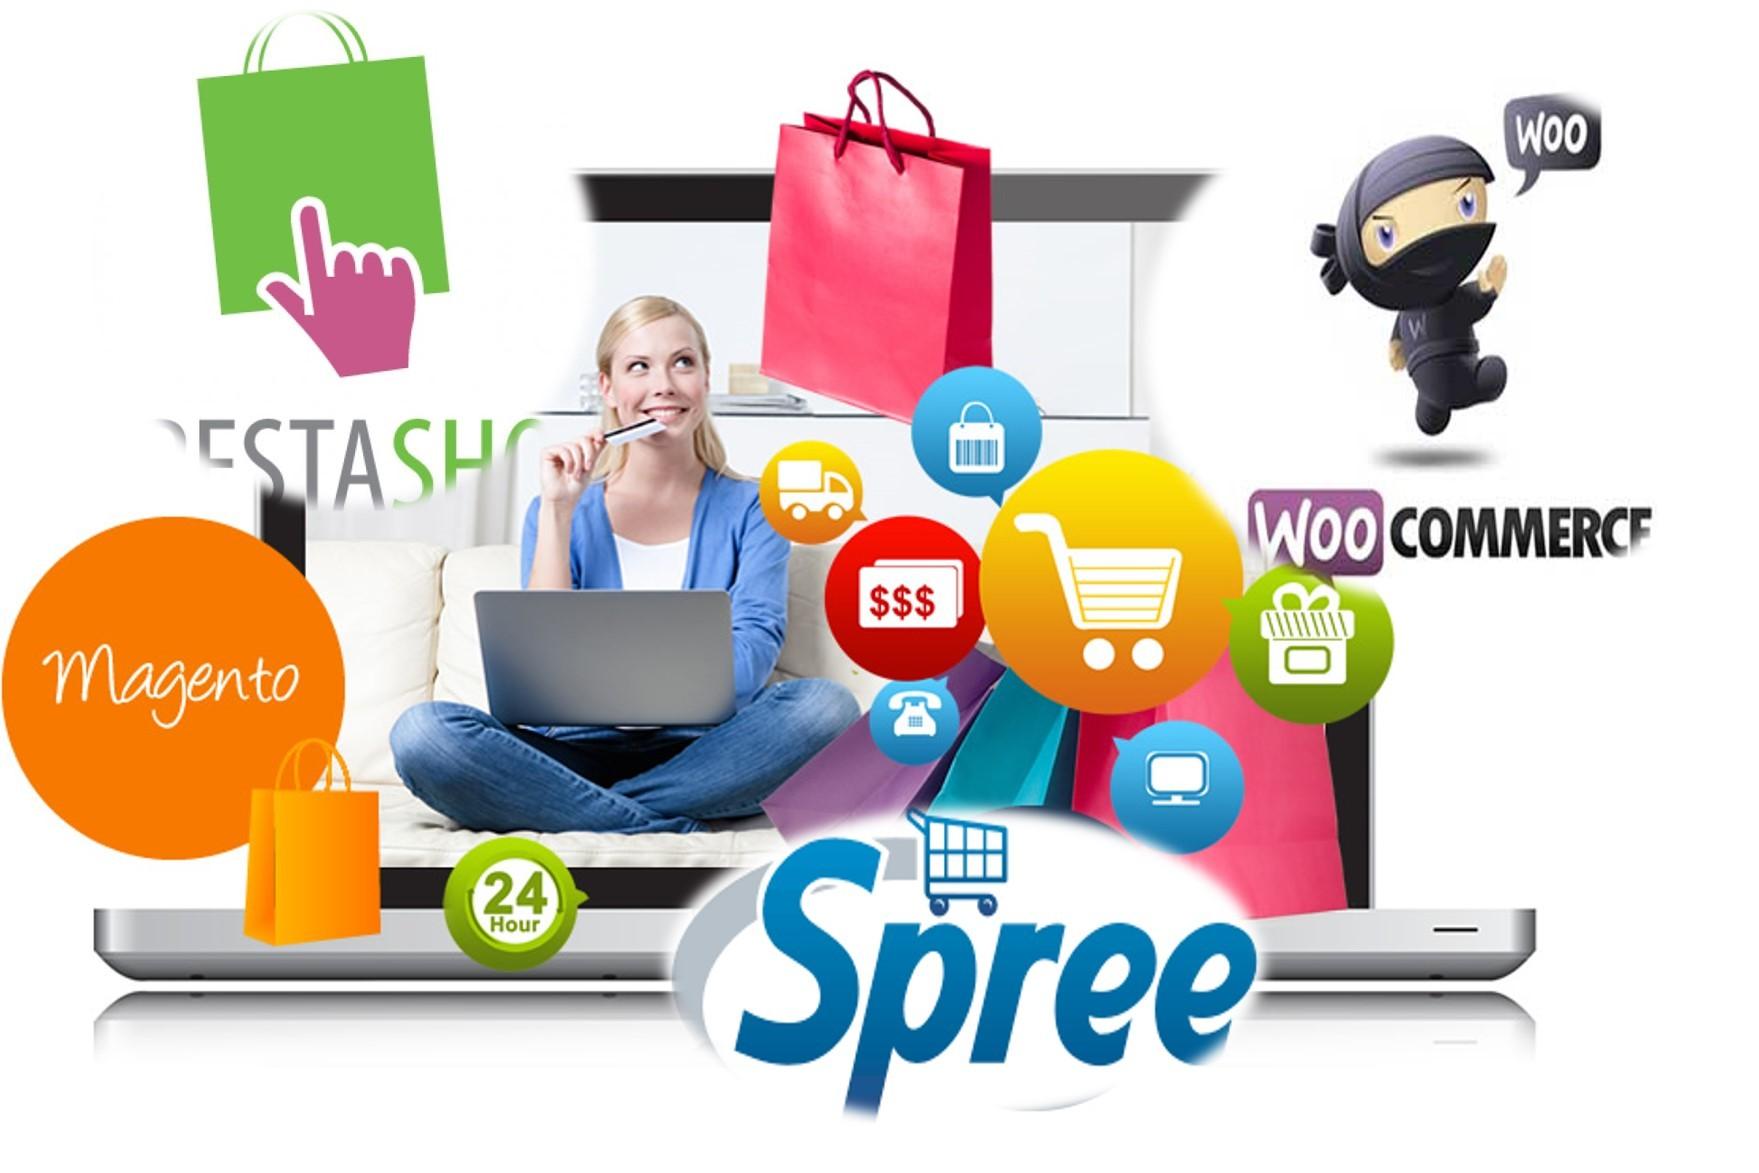 Opensource ecommerce platform